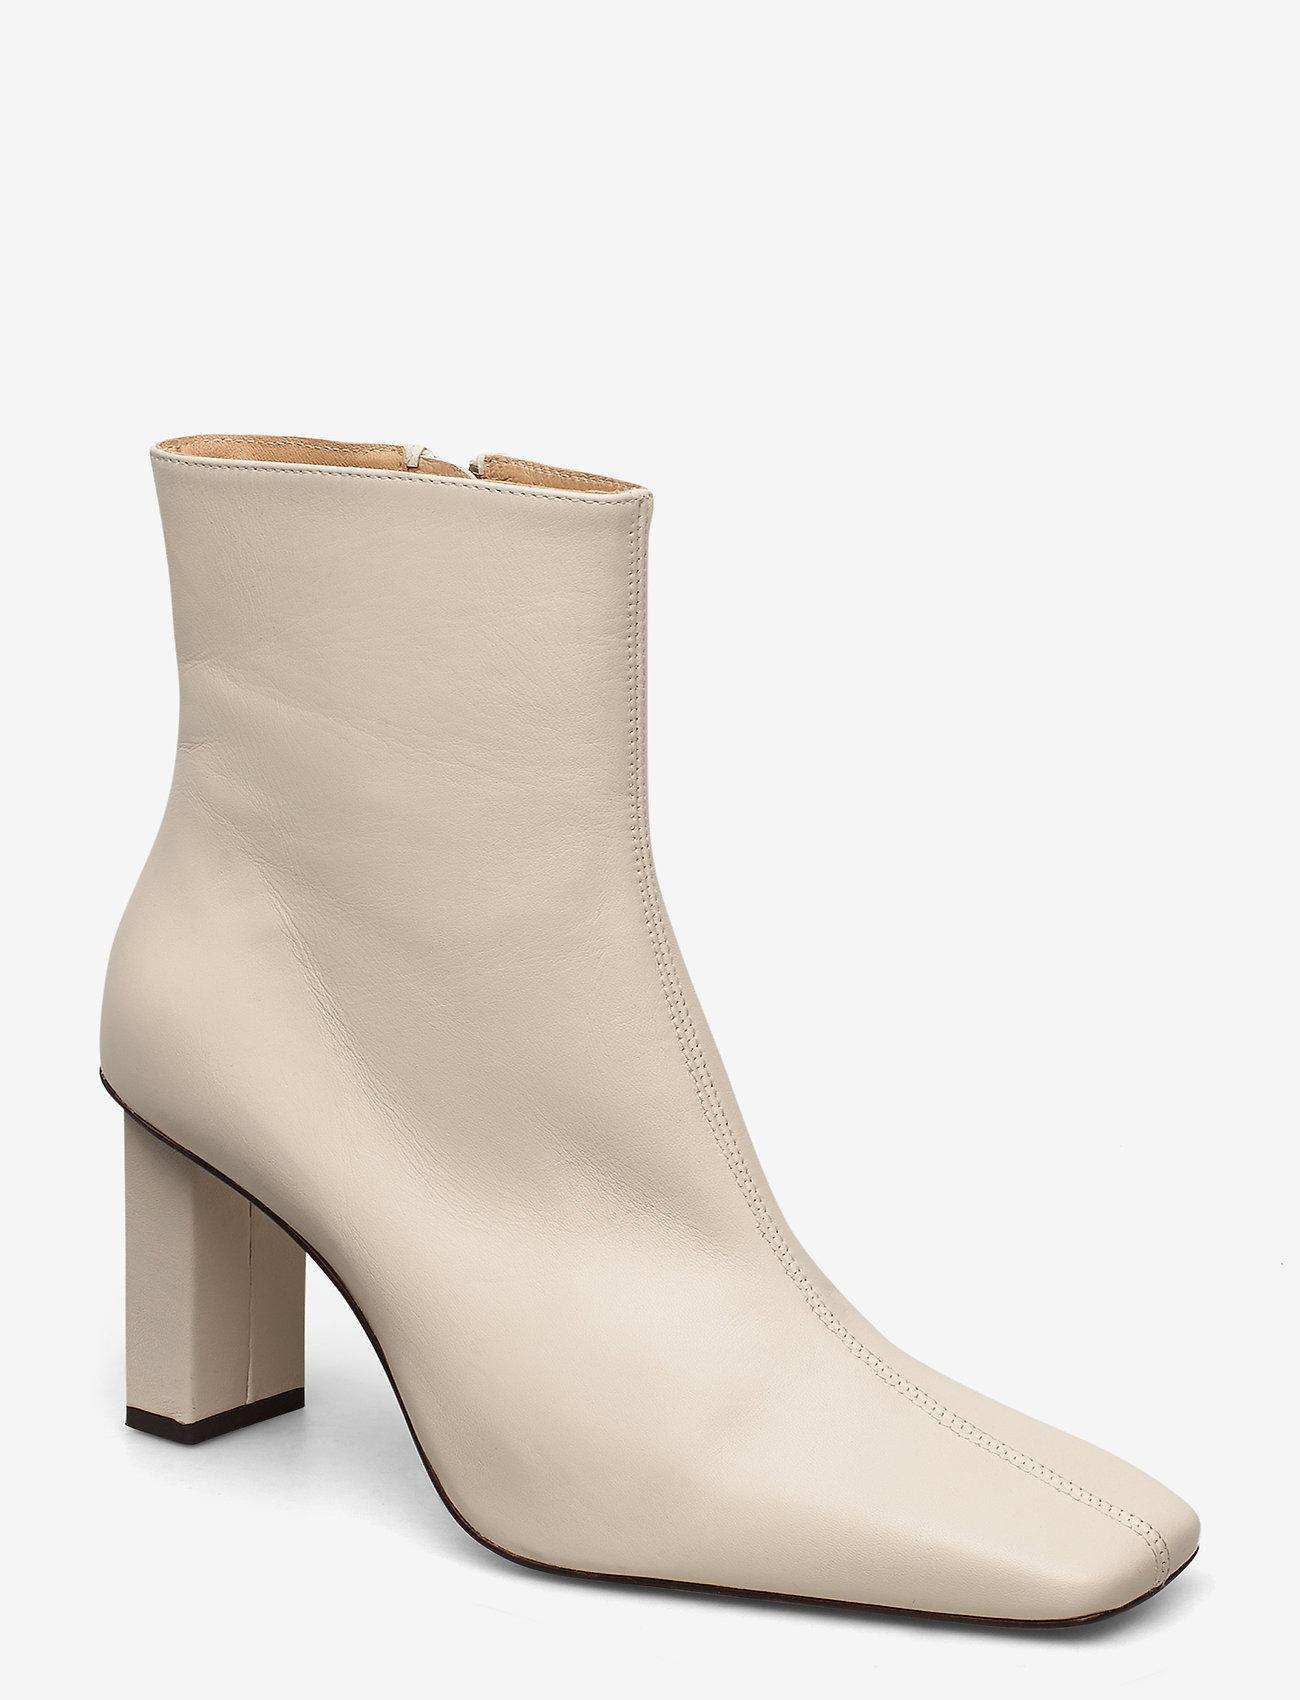 JOAN LE CARRÉ Ankle Boot